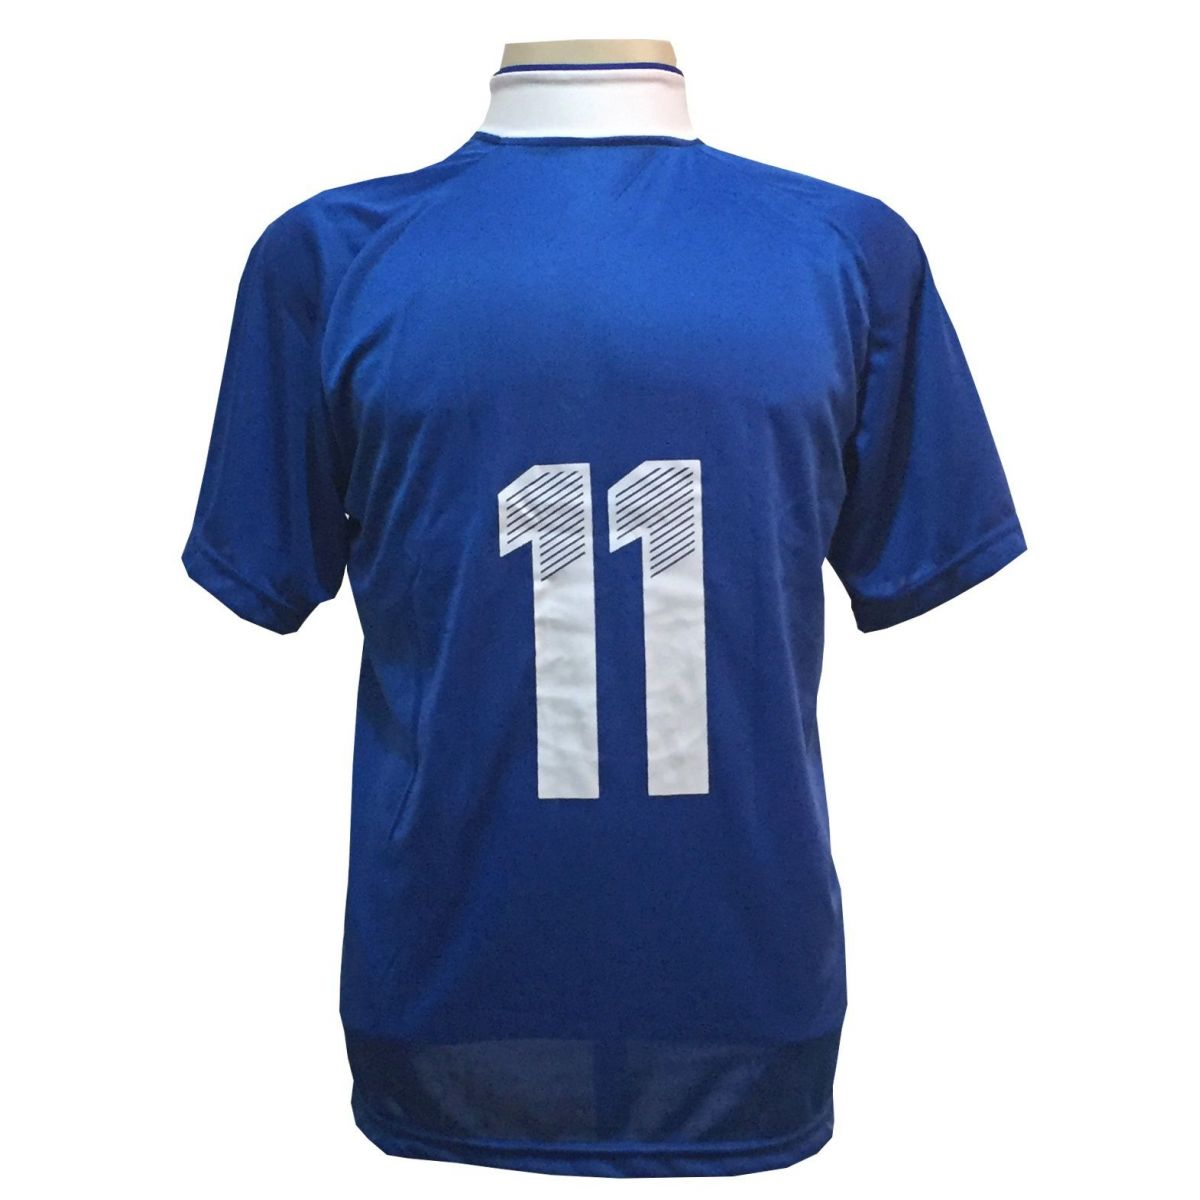 Uniforme Esportivo com 12 camisas modelo Milan Royal/Branco + 12 calções modelo Copa Royal/Branco + Brindes